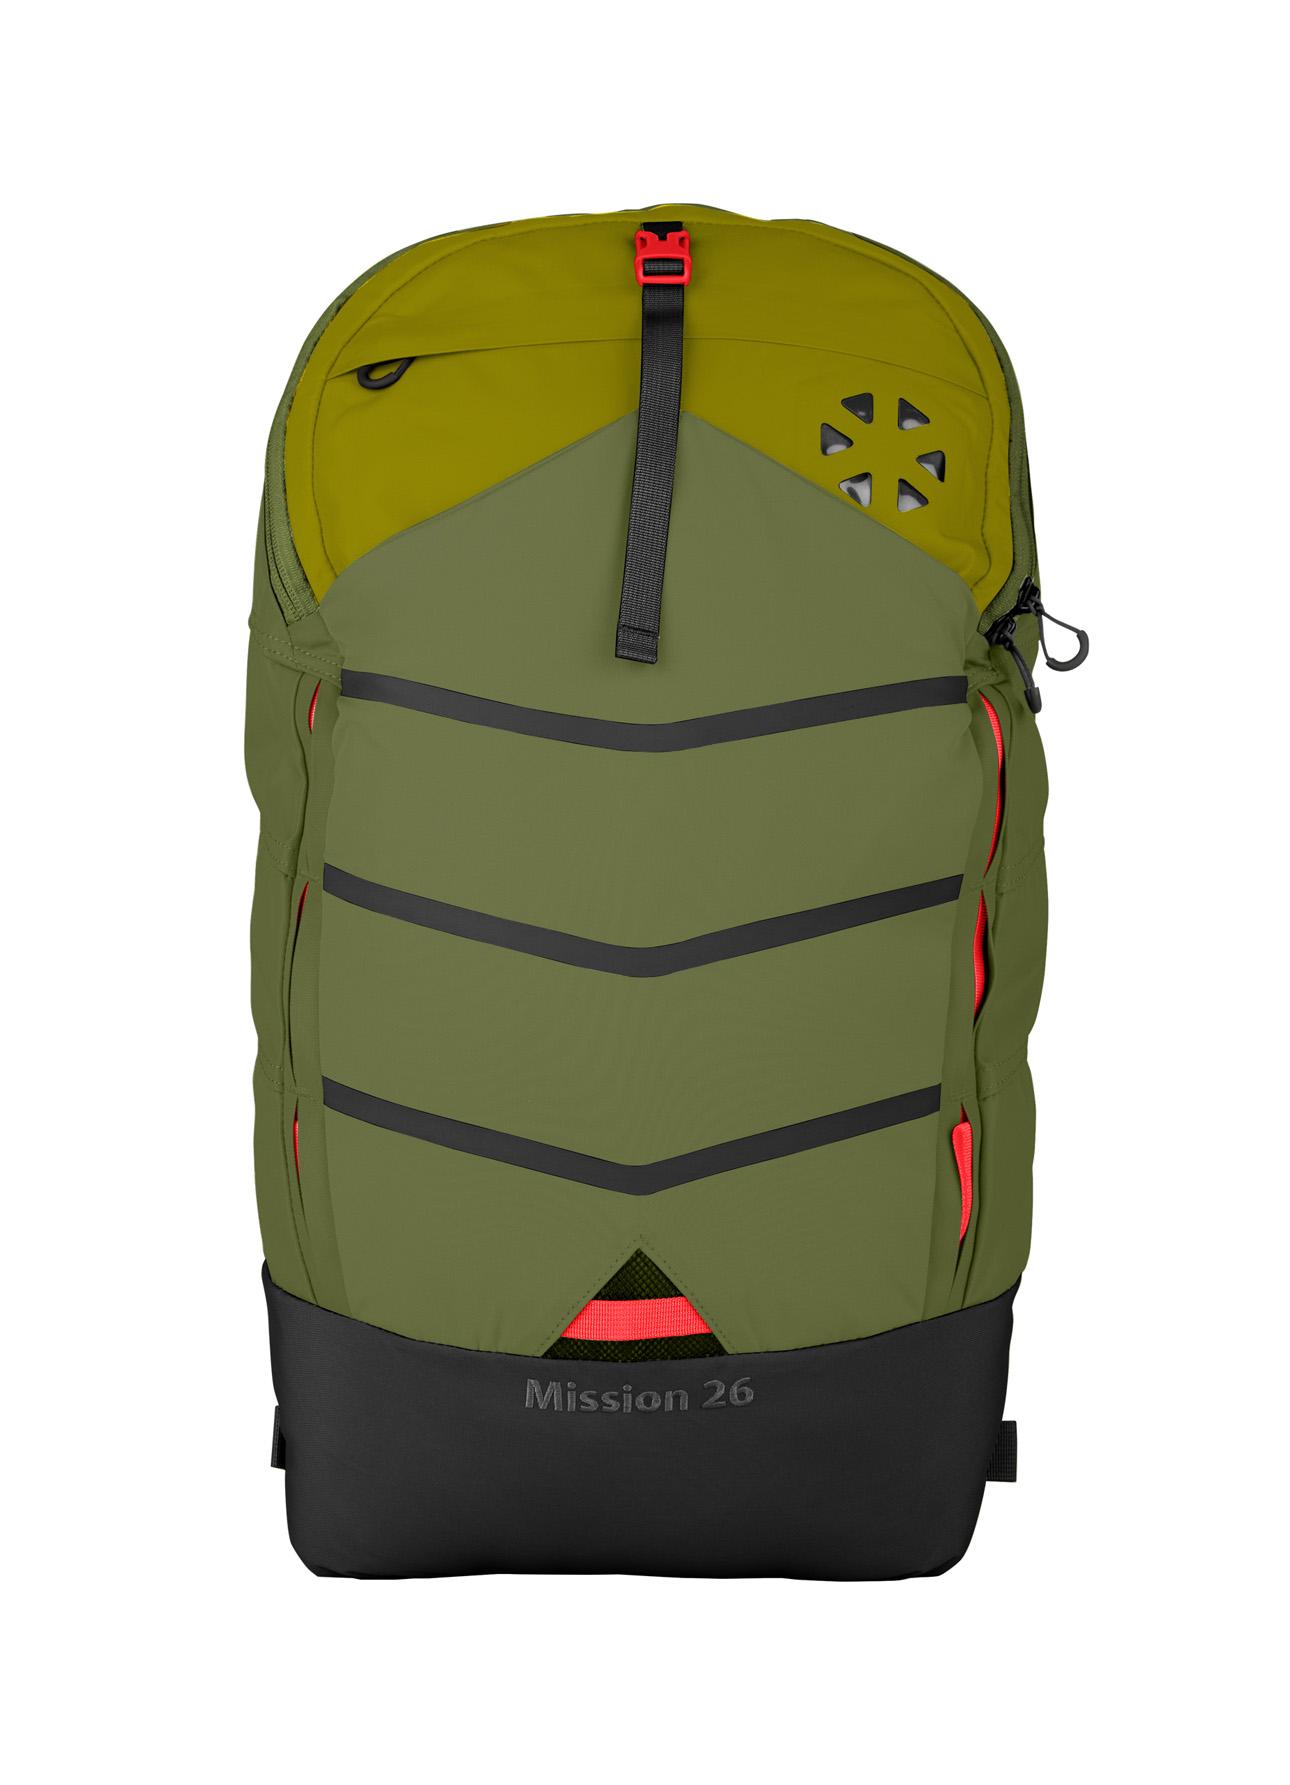 《台南悠活運動家》 BOREAS 美國 Mission 26 輕量日用背包 BO0171A